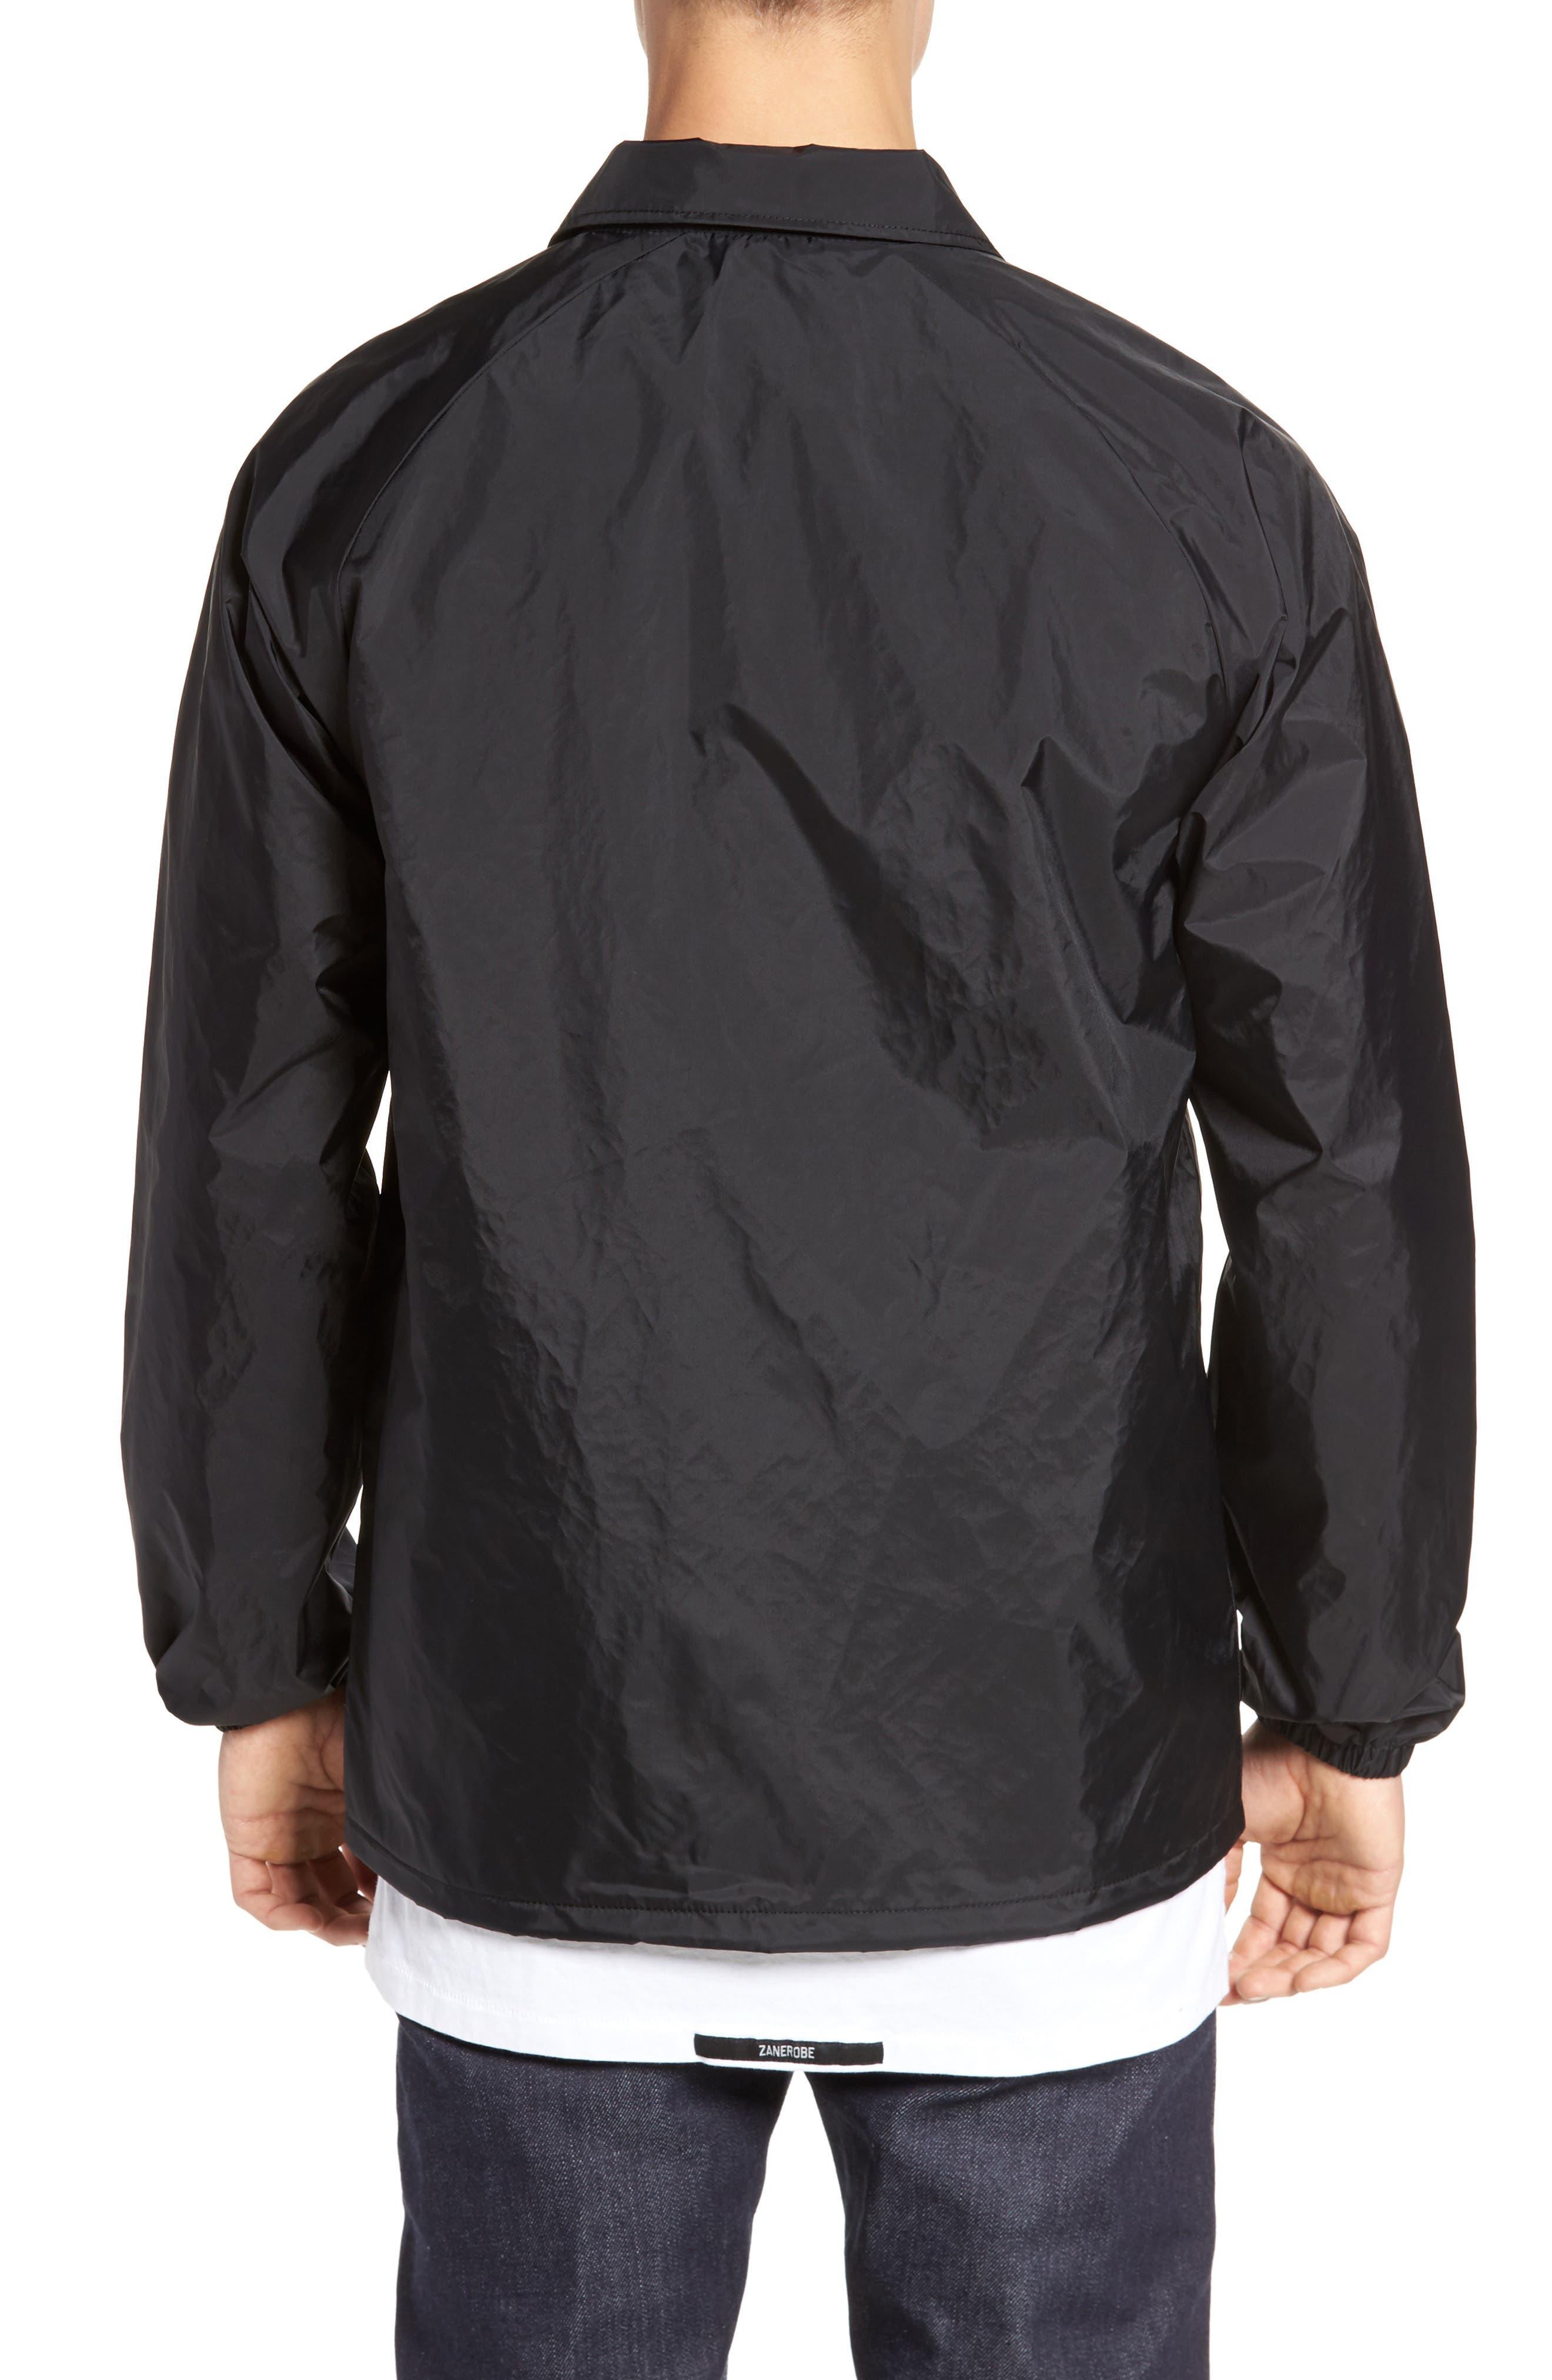 Torrey Water Resistant Jacket,                             Alternate thumbnail 2, color,                             BLACK/ WHITE